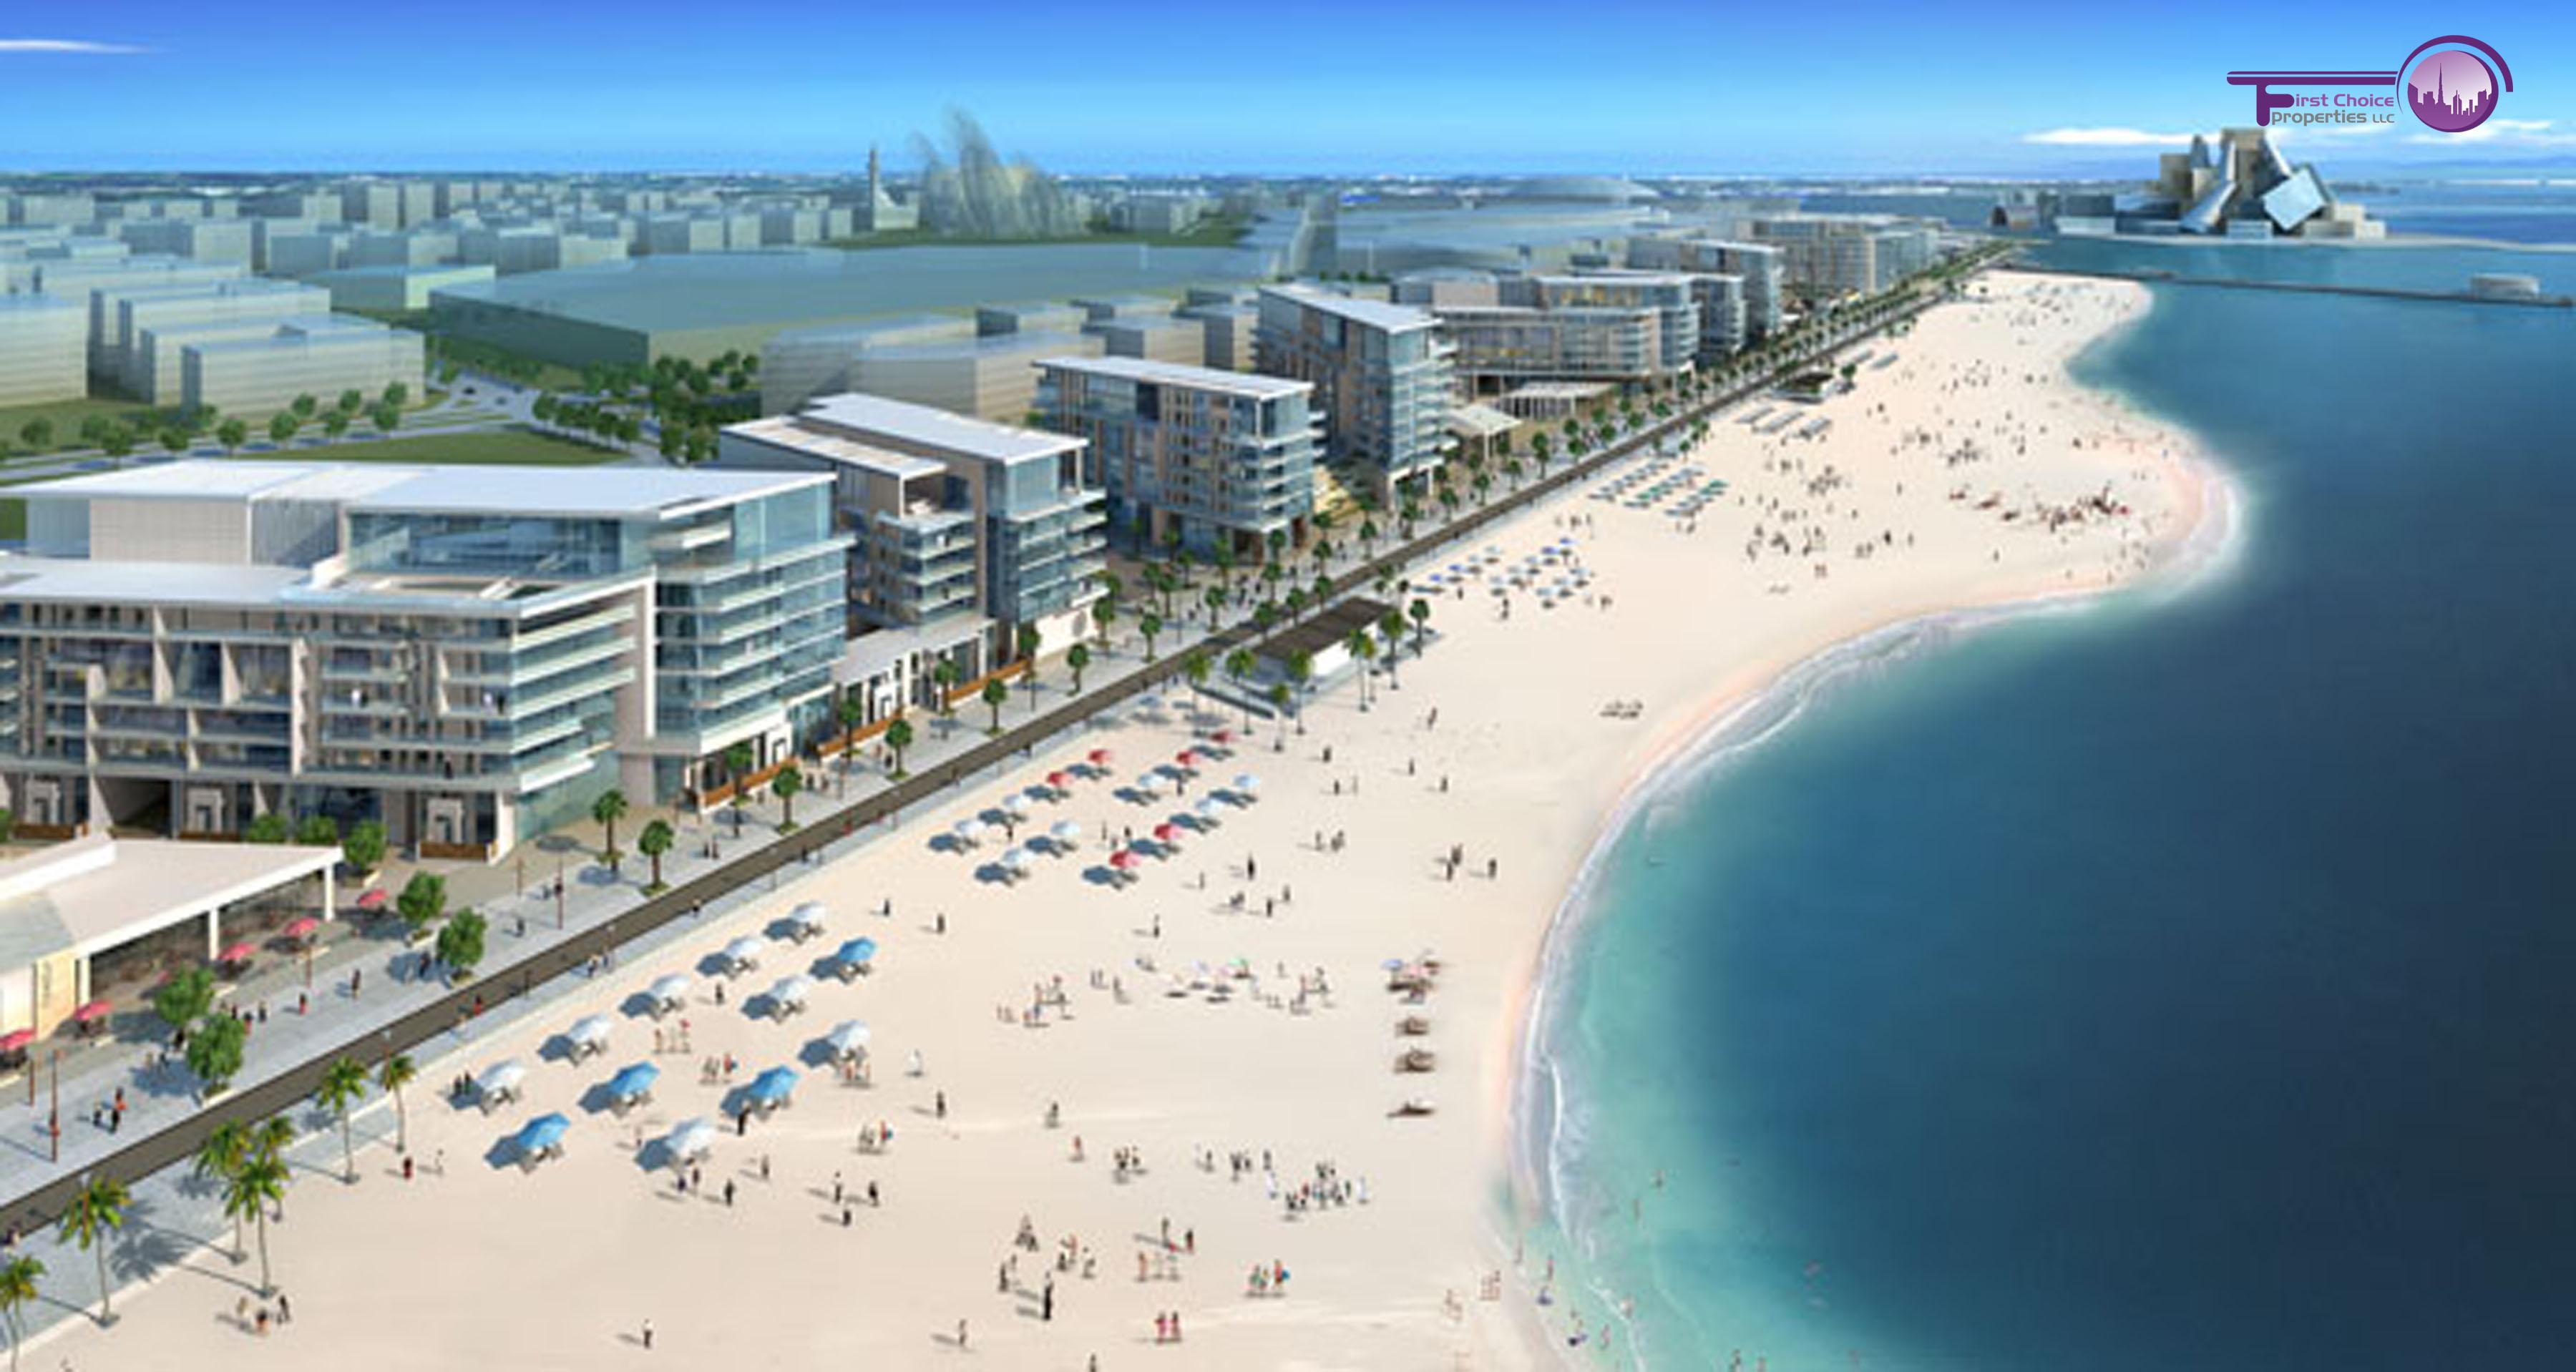 Studio - 1BR - 2BR - 3BR - 4BR Apartment  - Abu Dhabi - UAE - Saadiyat Island - Mamsha Al Saadiyat (17).jpg